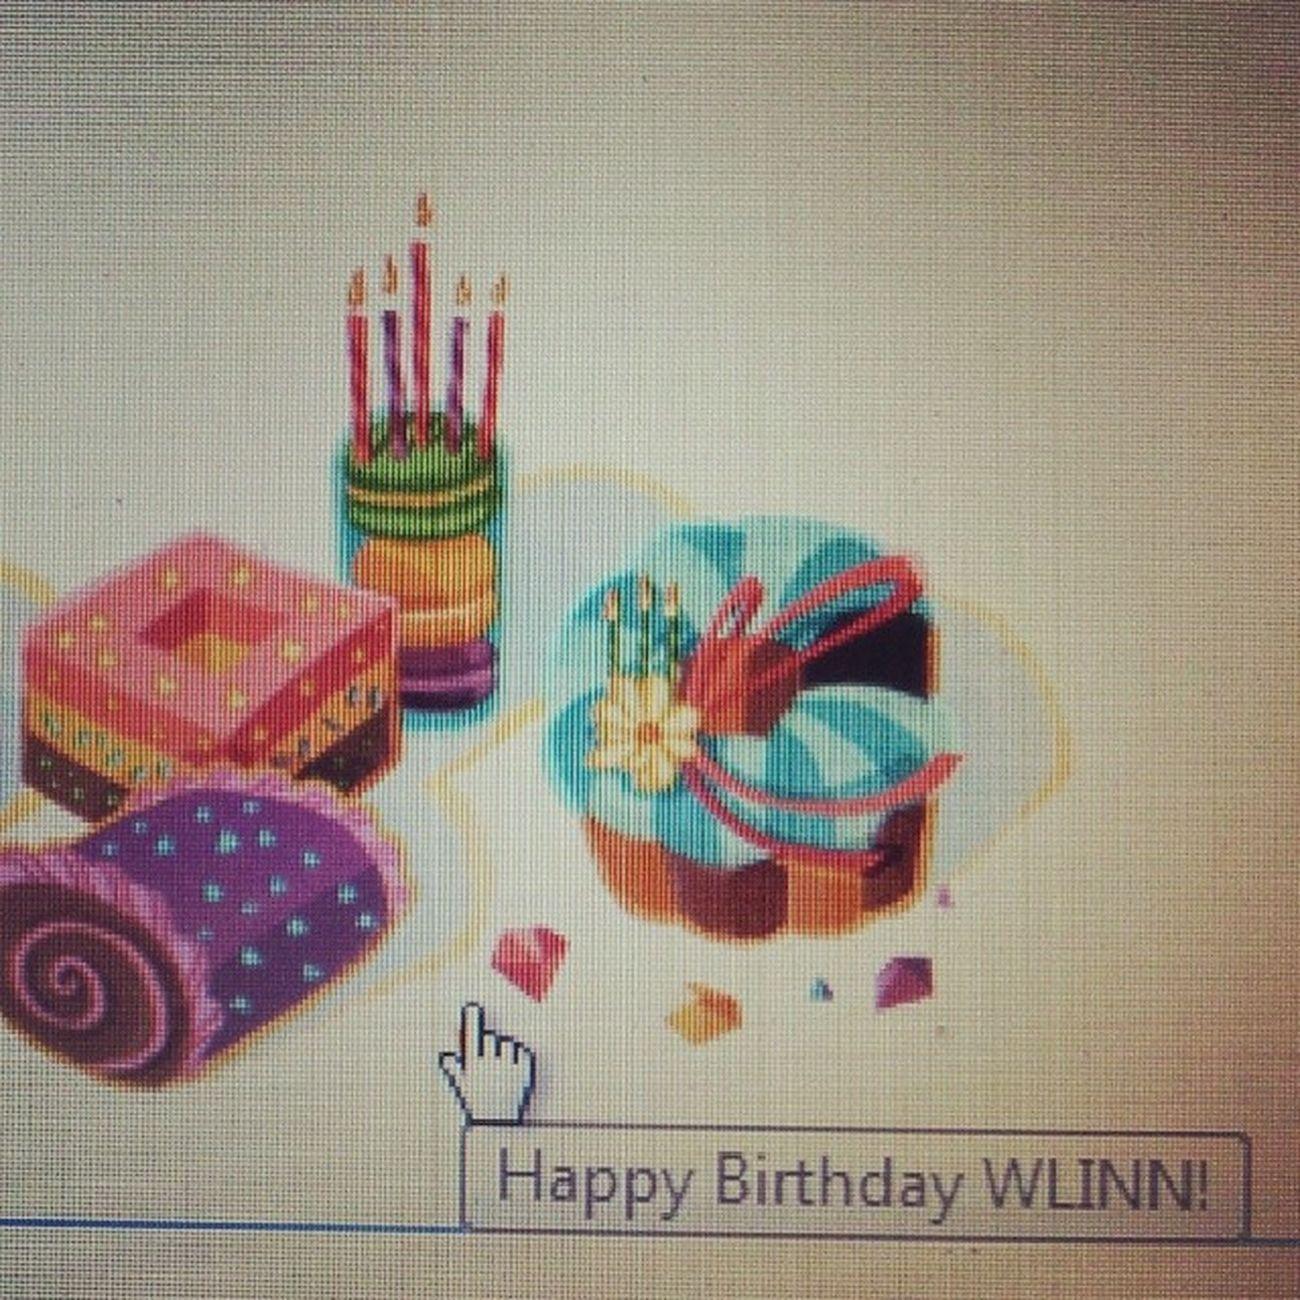 Google รู้อีกแล้วว่าวันเกิด 555 AfterHBD